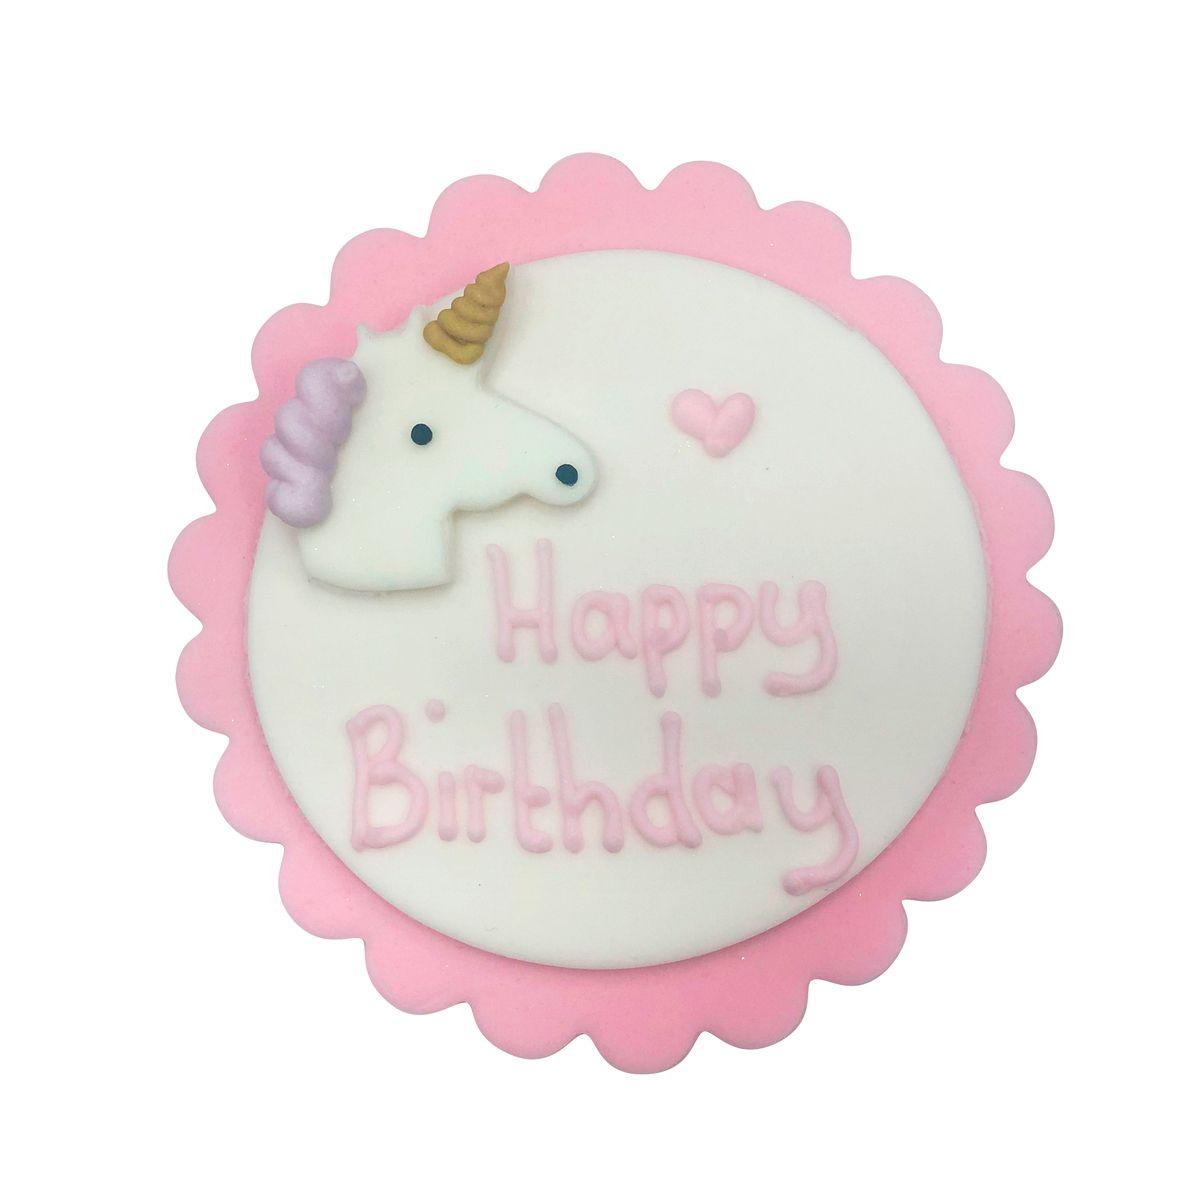 Plaque en sucre Happy Birthday licorne rose et blanche 7.5 cm - Anniversary House